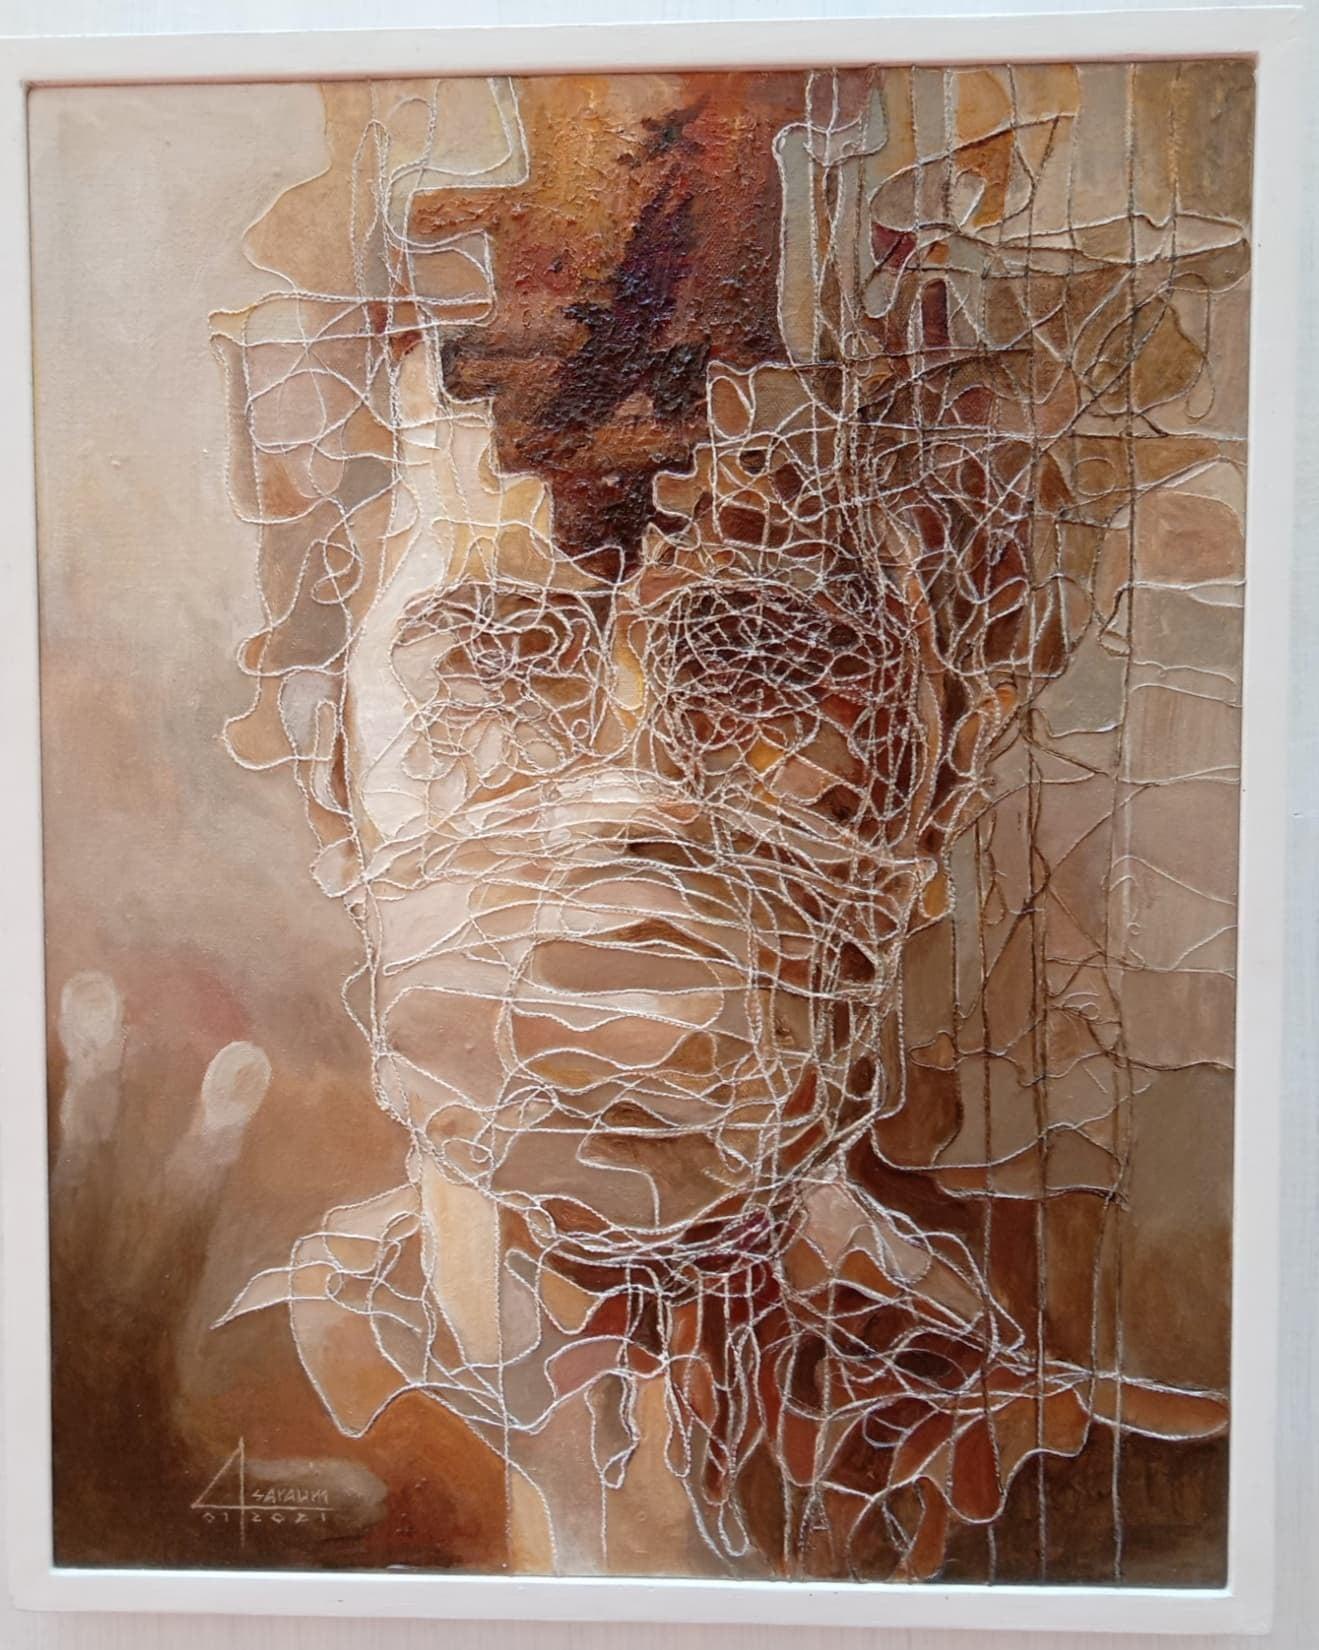 COVID 19 pandemic art